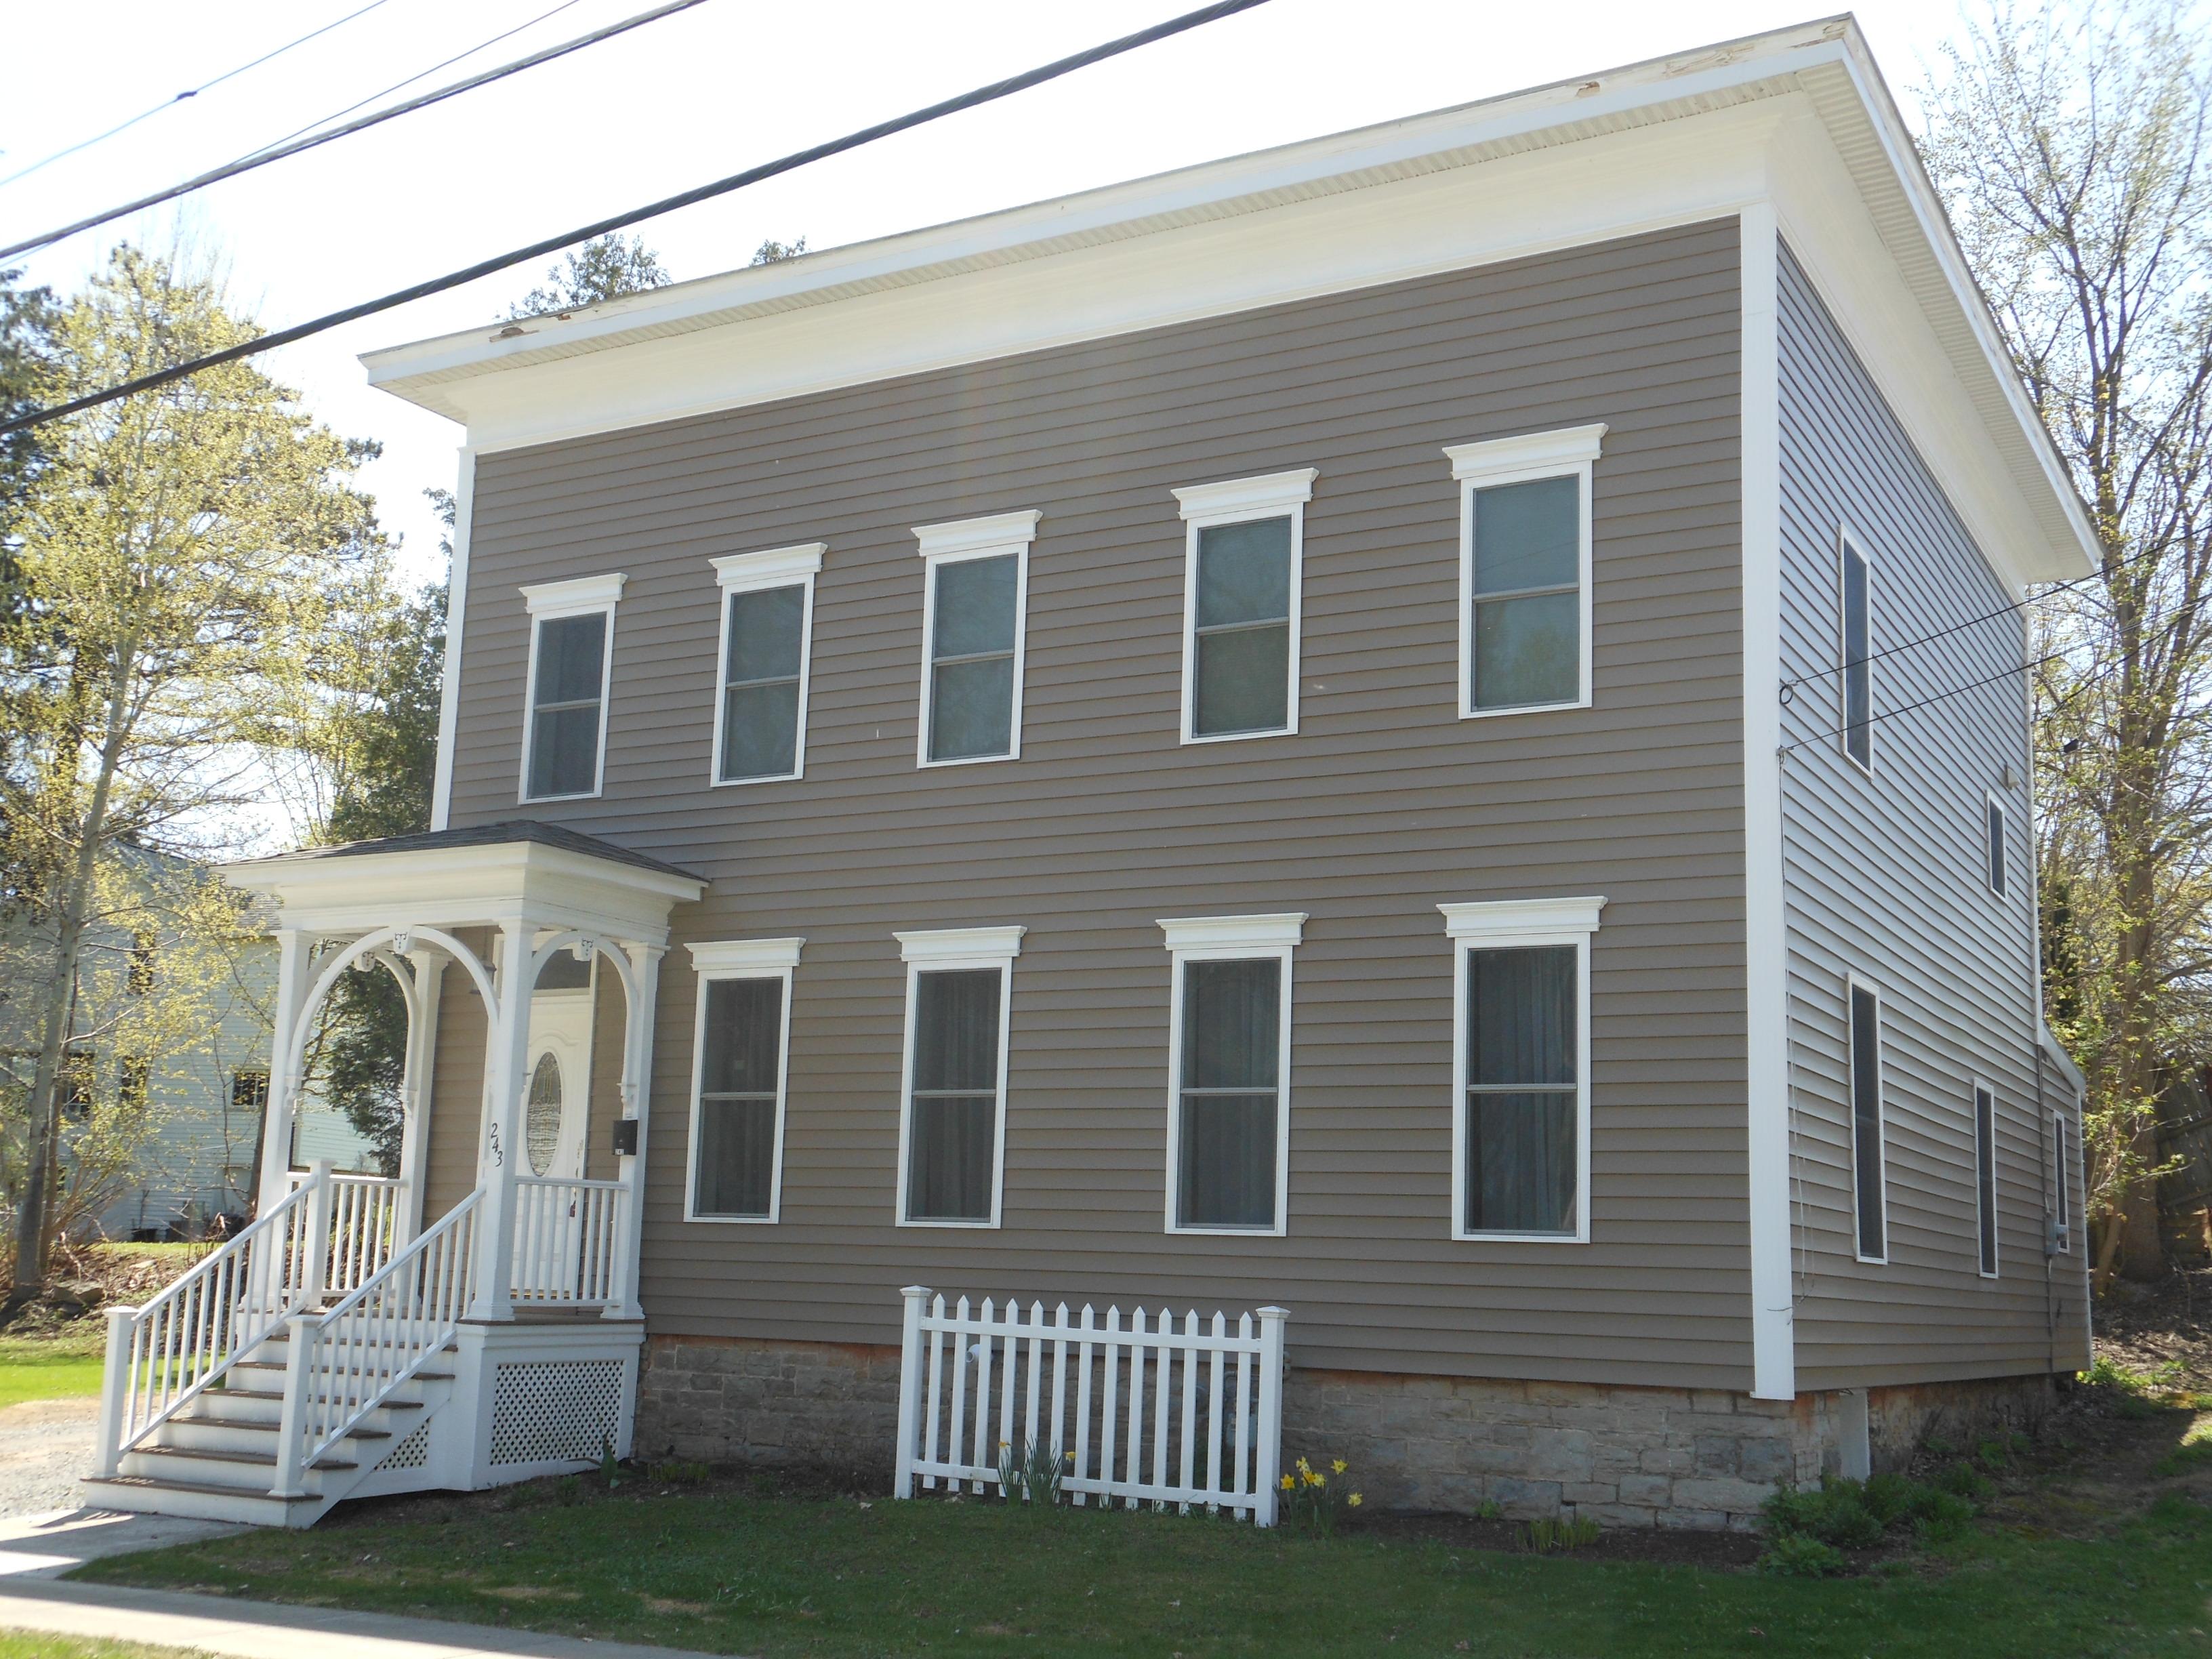 243 Tower Street, Waterville, New York 13480